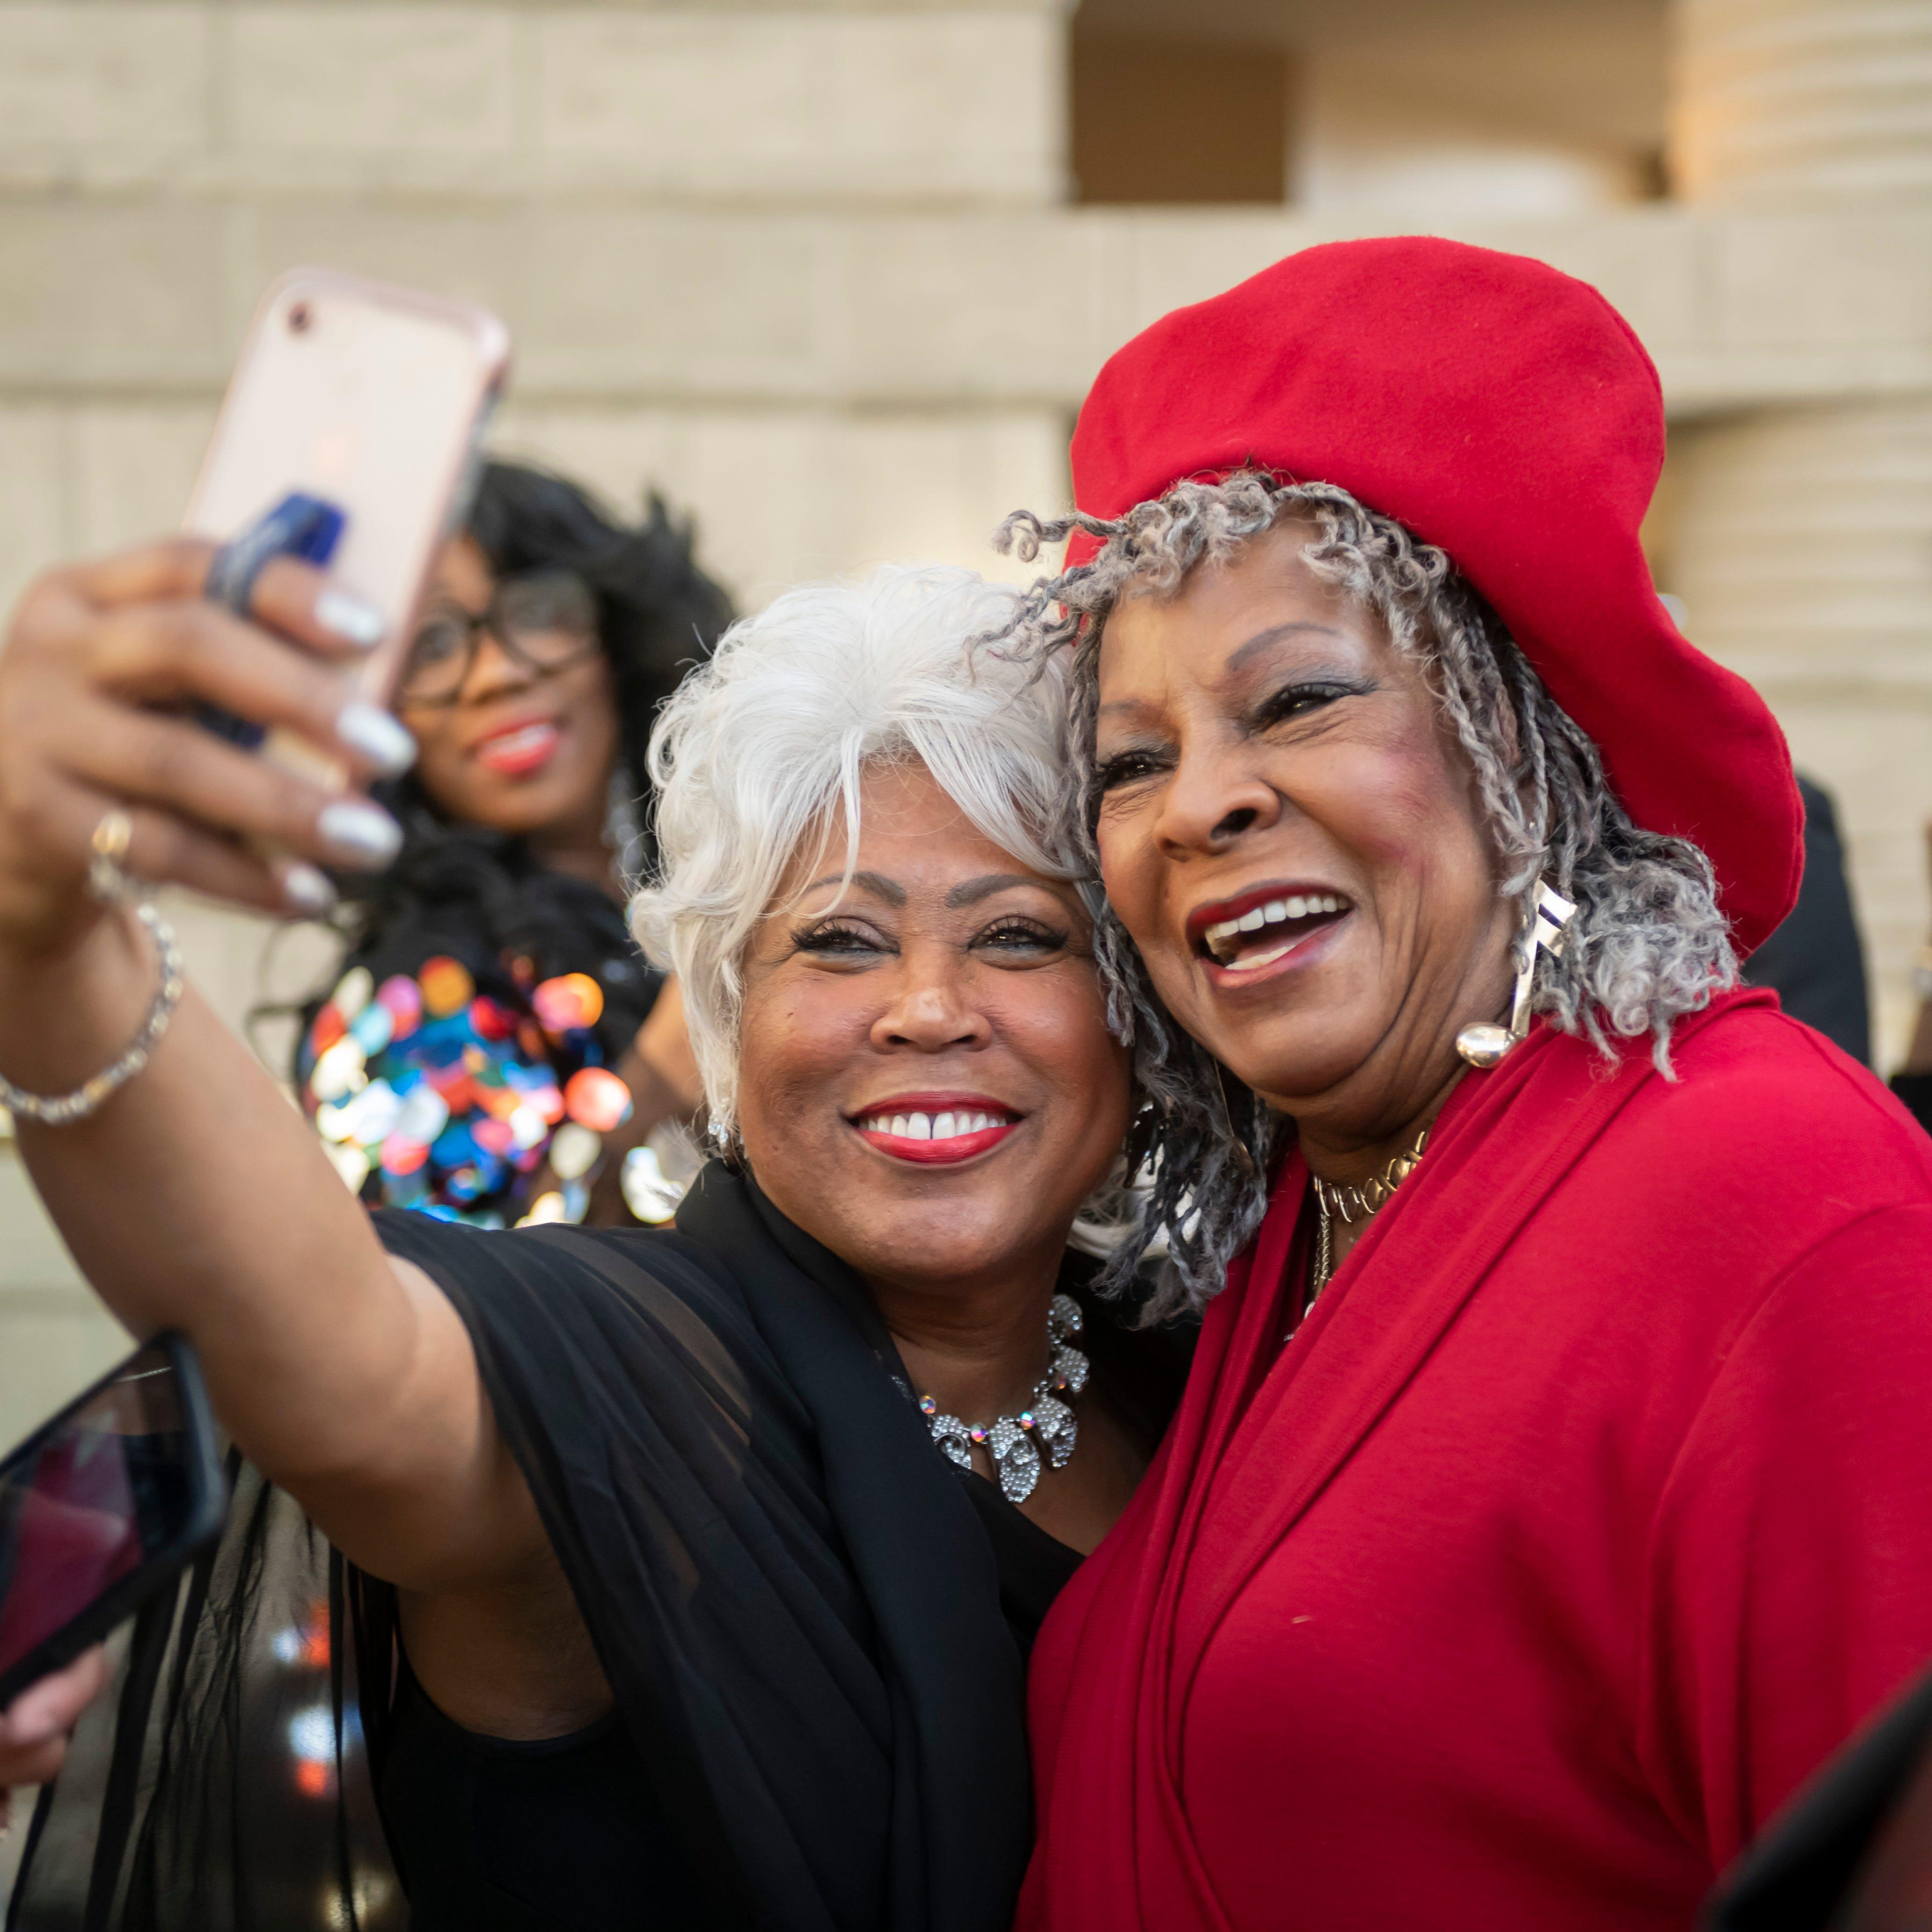 Aretha Franklin's birthday, film premiere celebrated